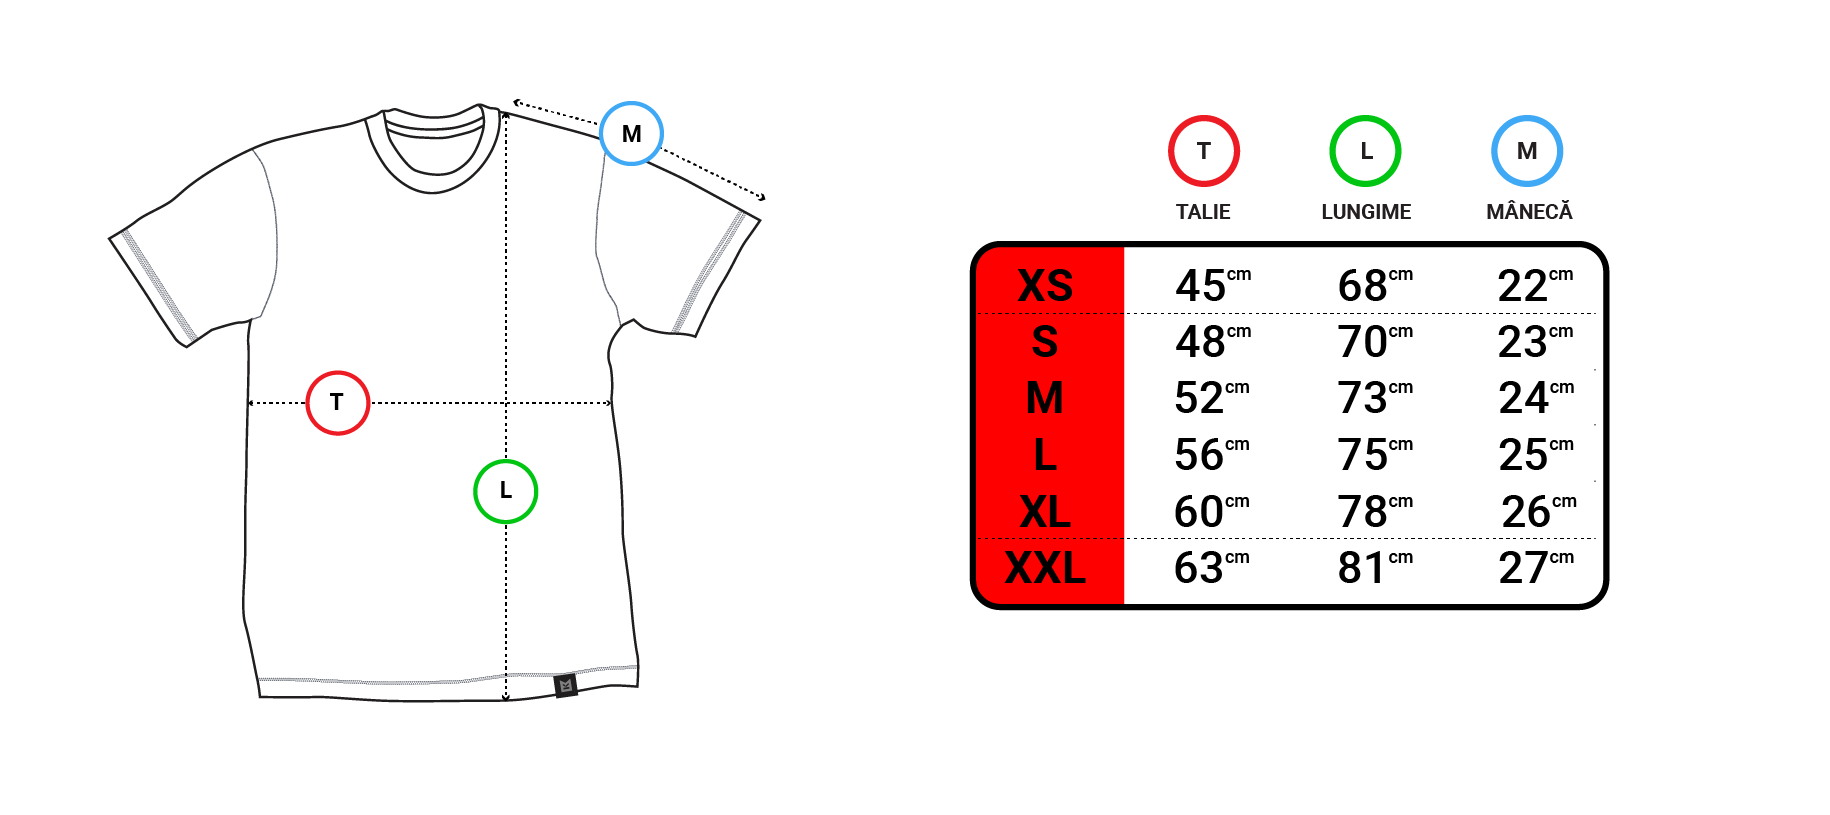 225200 nane krckbrnd tshirt size chart